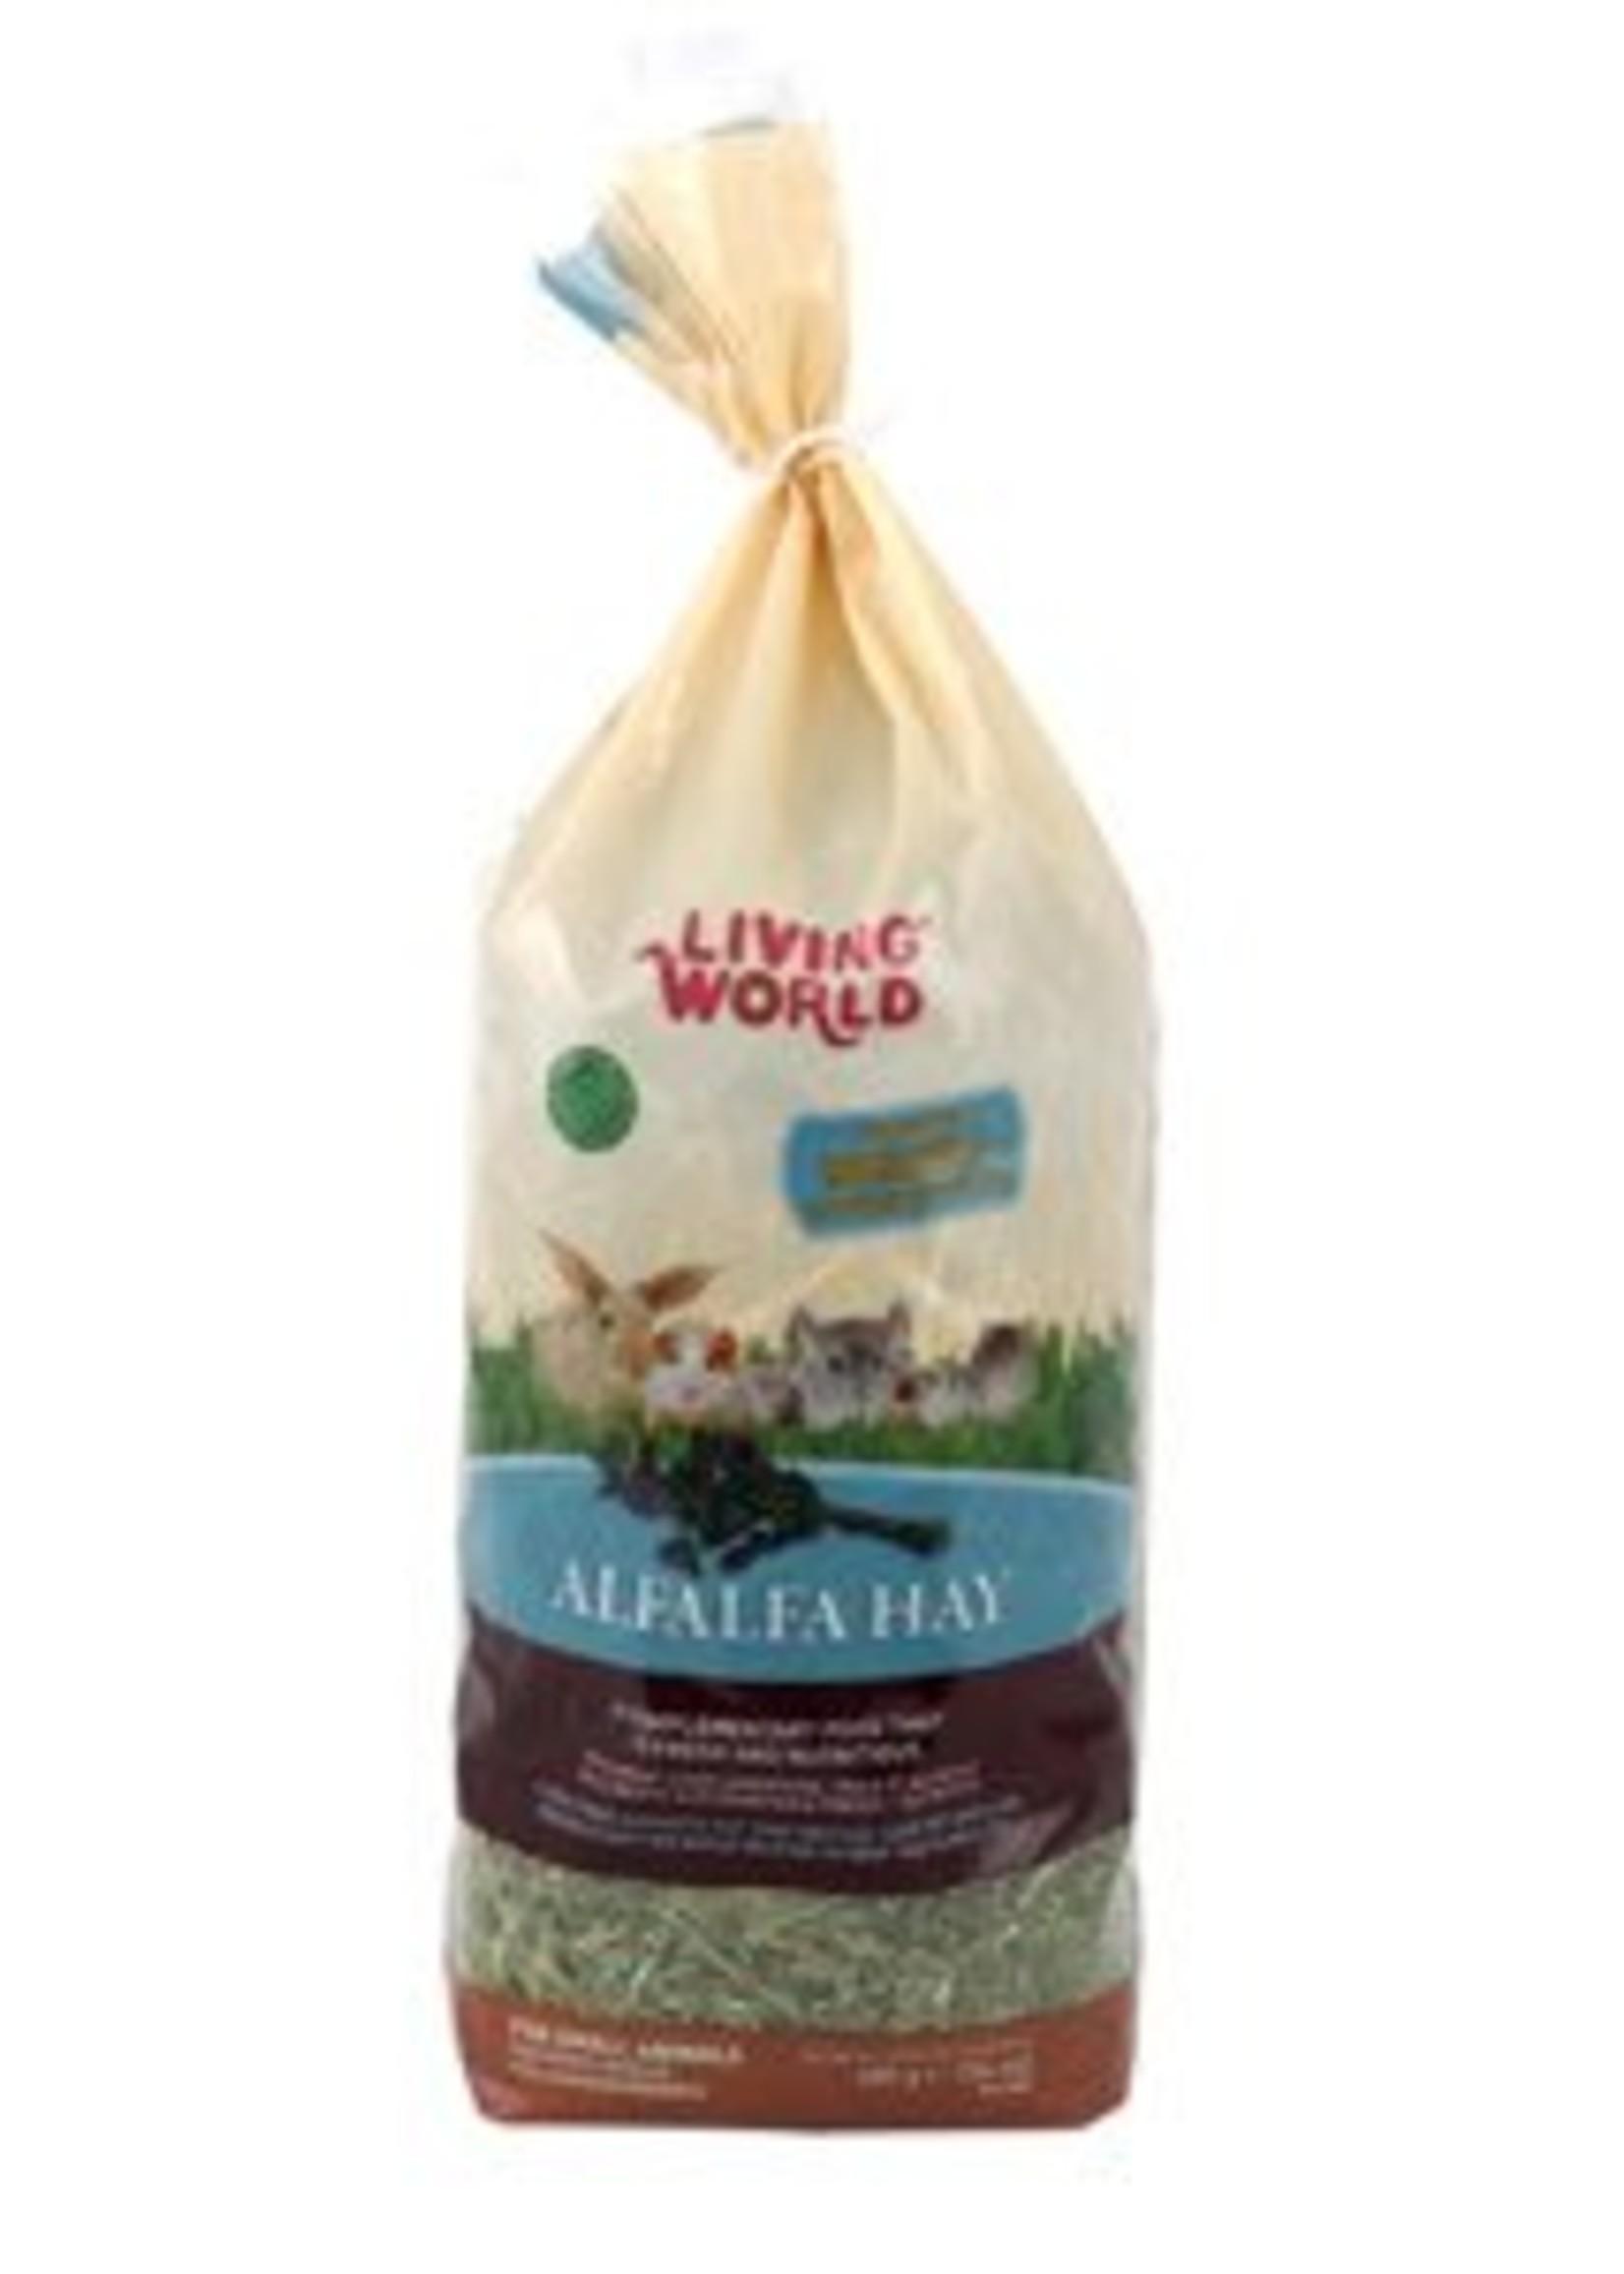 Living World Living World Alfalfa - Large - 680 g (24 oz)